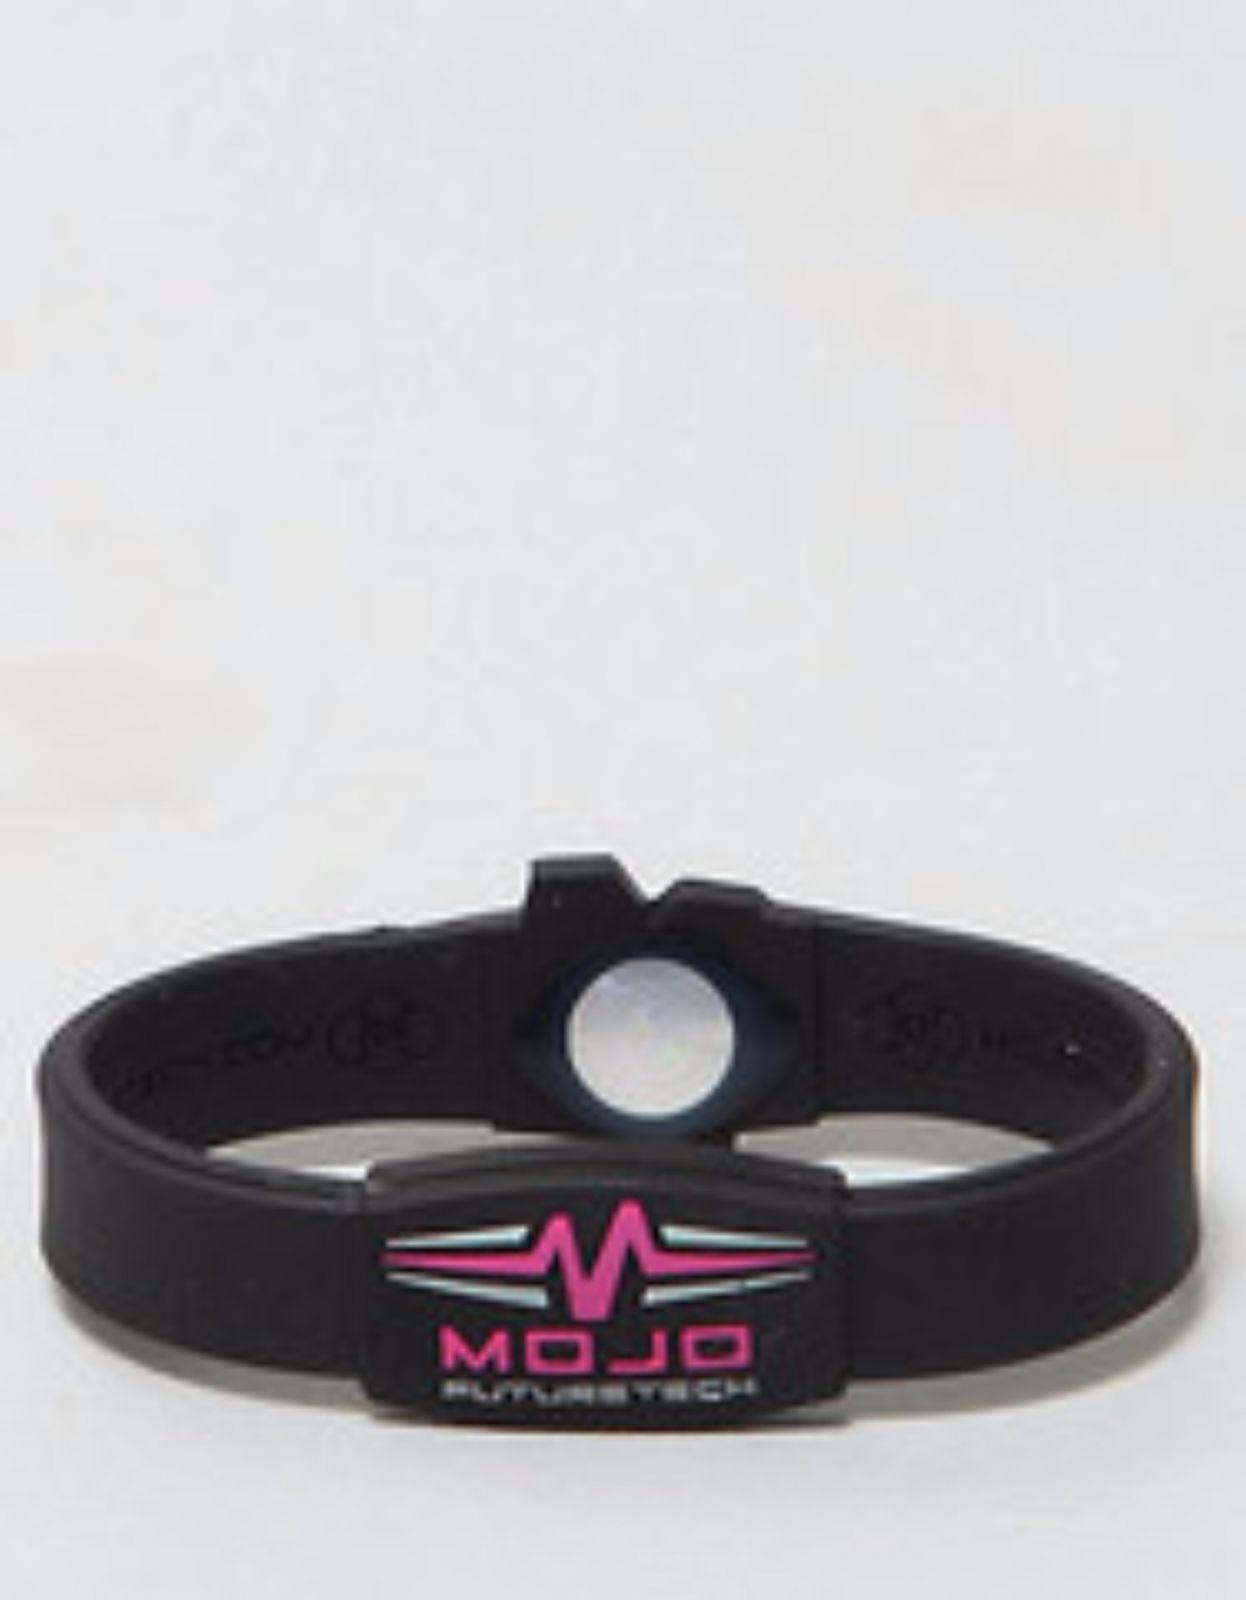 Mojo Wristbands